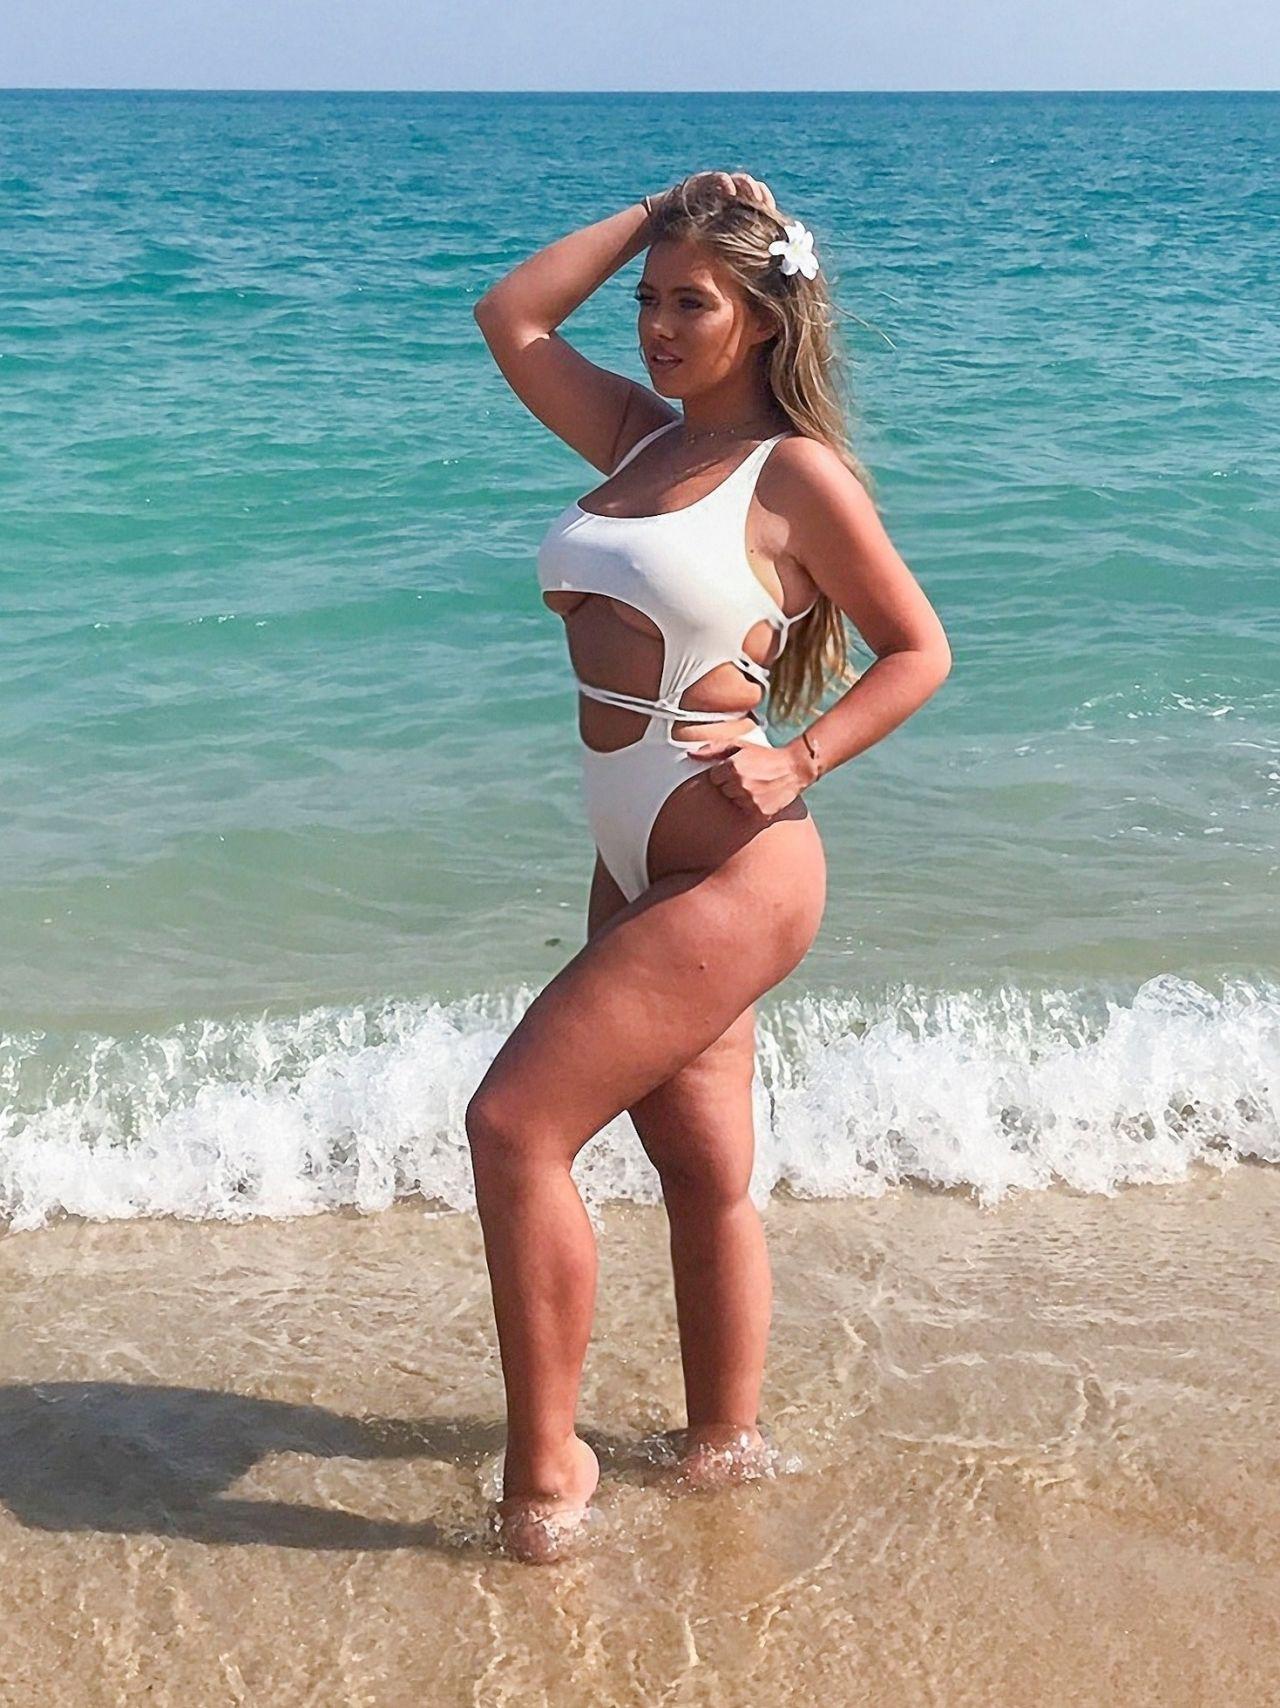 Bikini Tyne-Lexy Clarson nudes (58 pics) Paparazzi, Instagram, panties